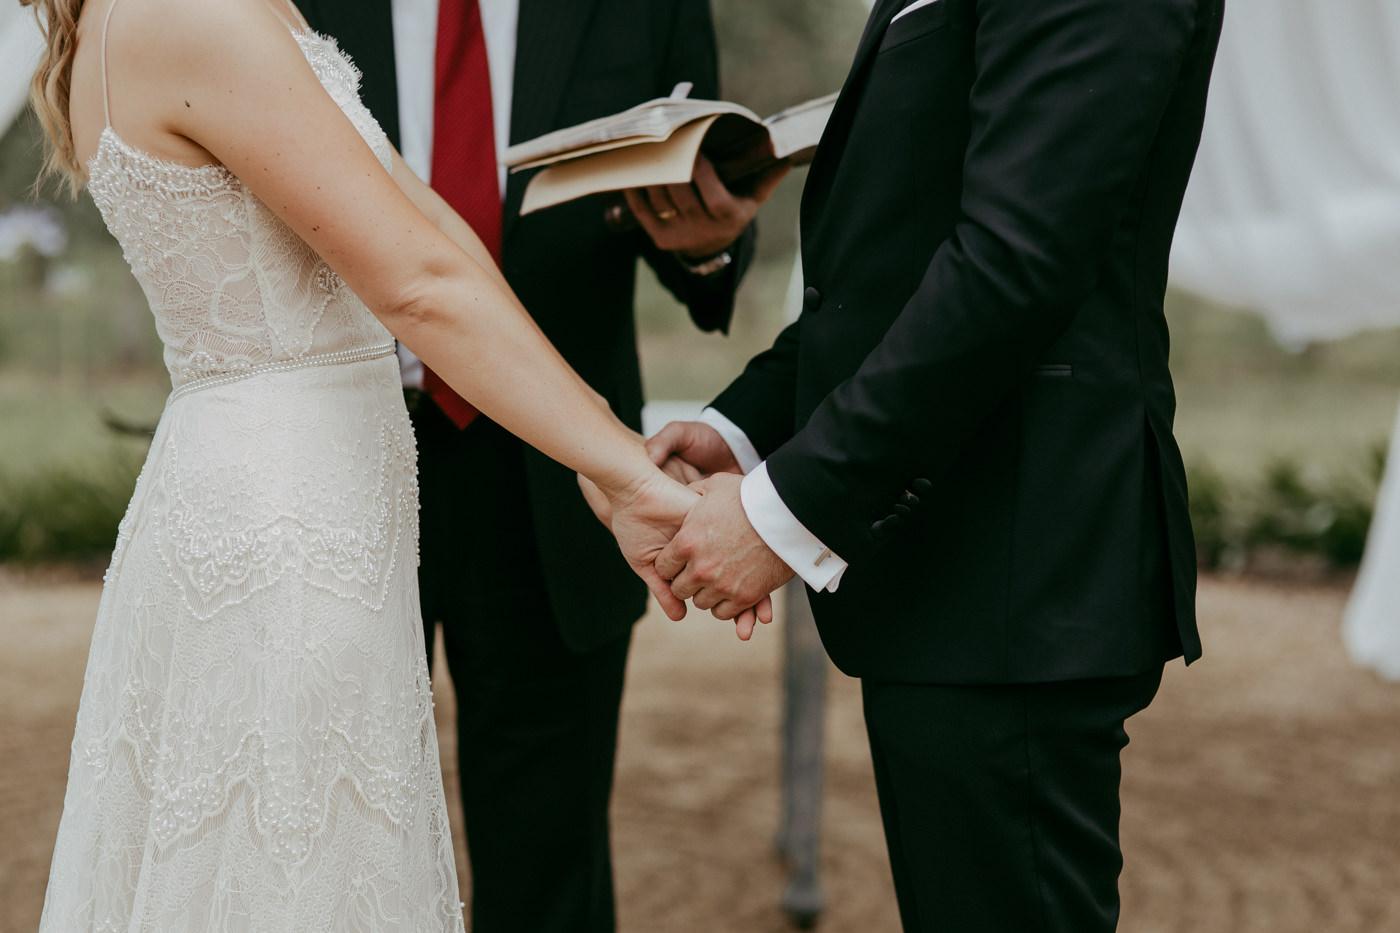 Anthony & Eliet - Wagga Wagga Wedding - Country NSW - Samantha Heather Photography-101.jpg